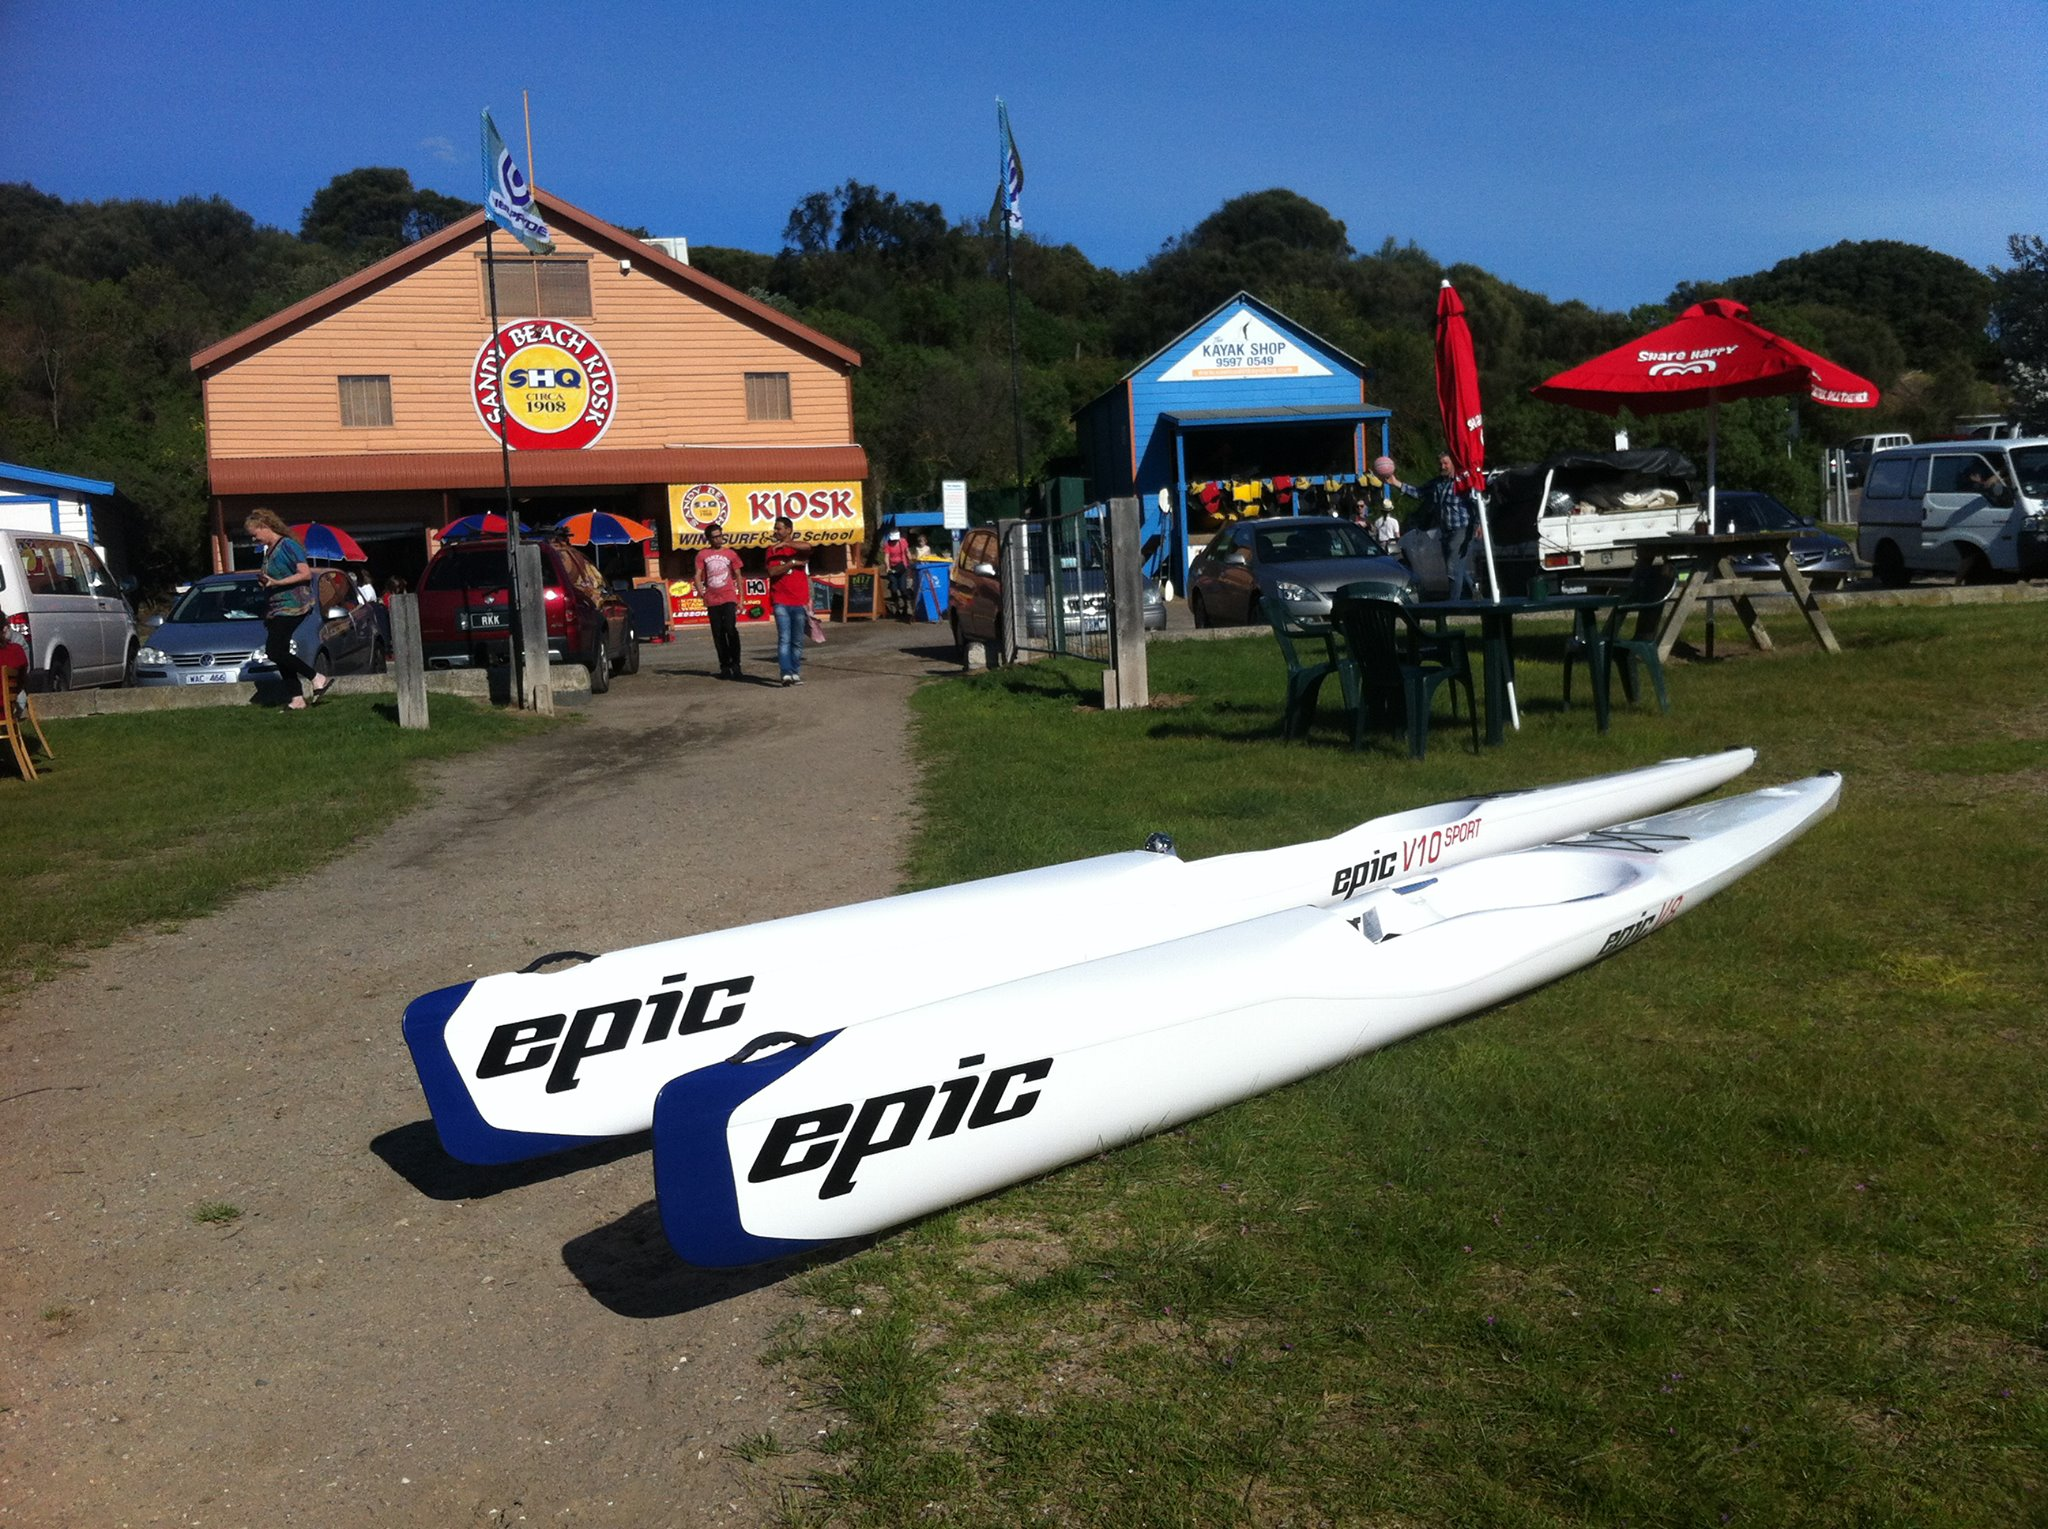 epic-surf-skis.jpg